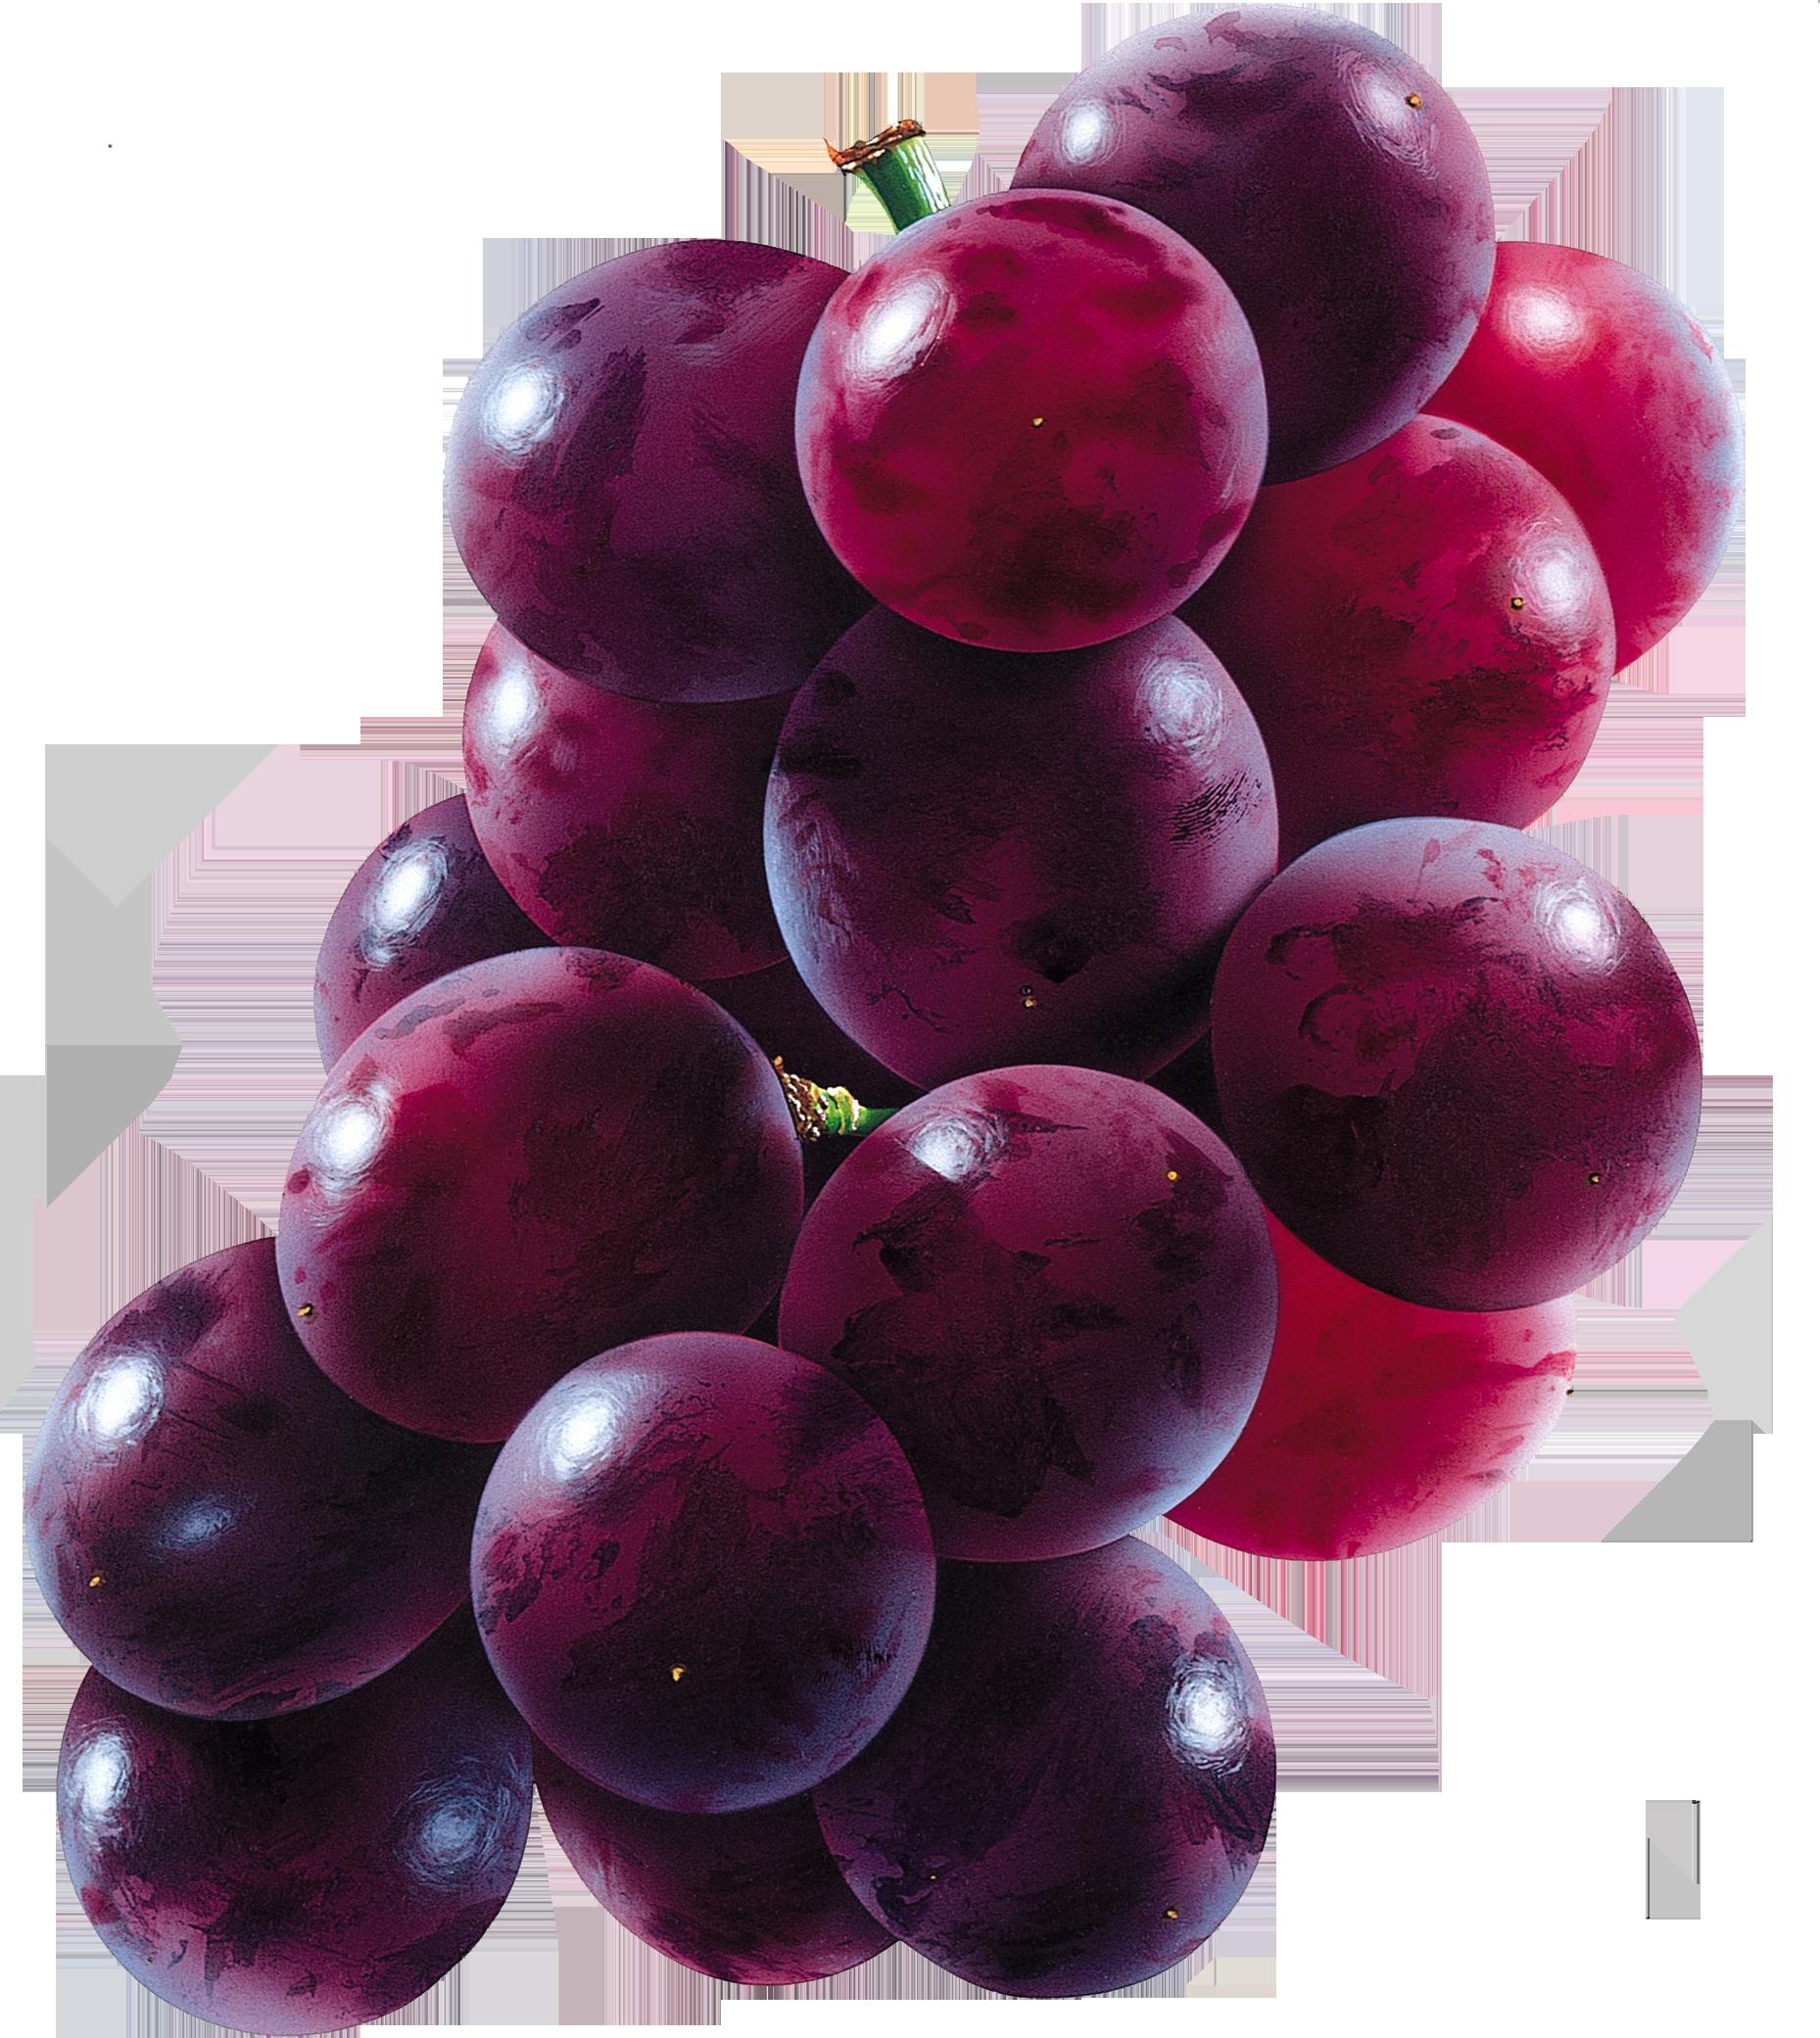 Grapes PNG - 21506